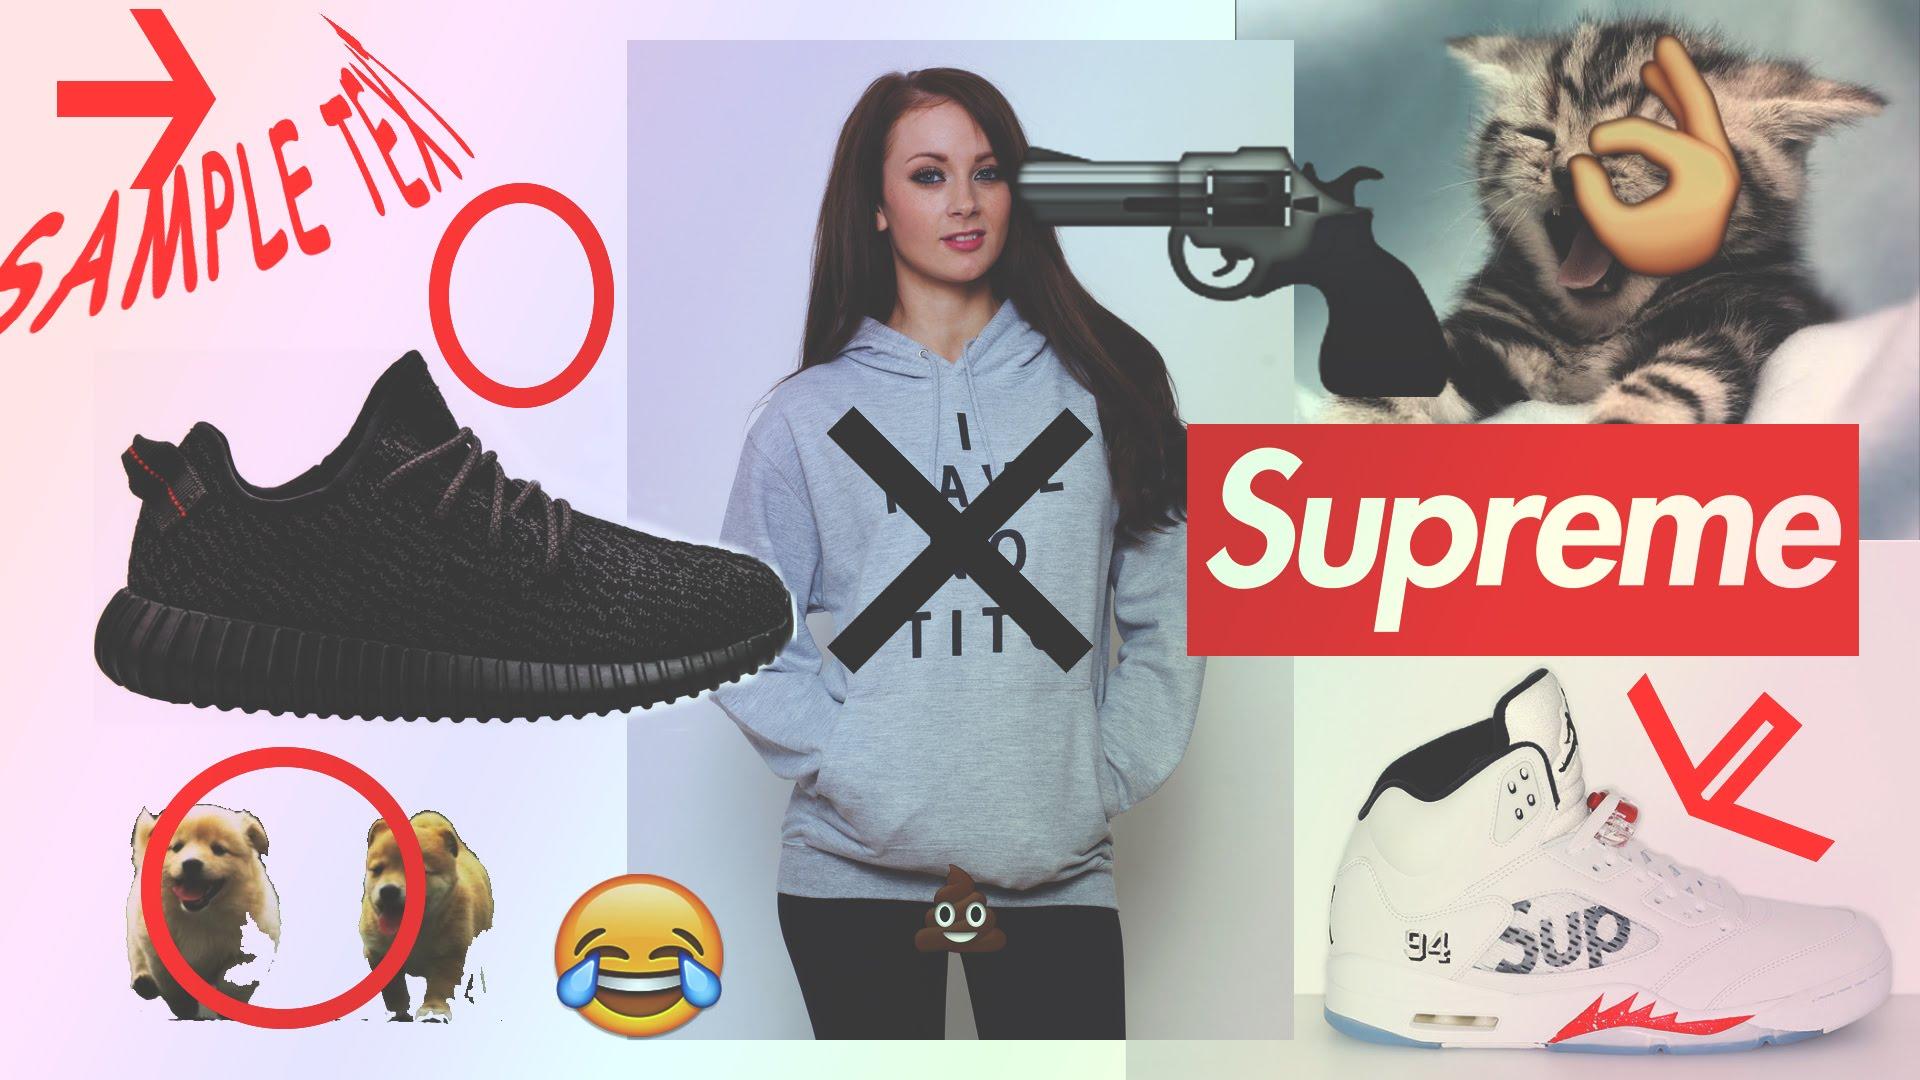 Supreme Wallpaper Full Hd Free Download Pc Desktop - Supreme Wallpaper Girl , HD Wallpaper & Backgrounds